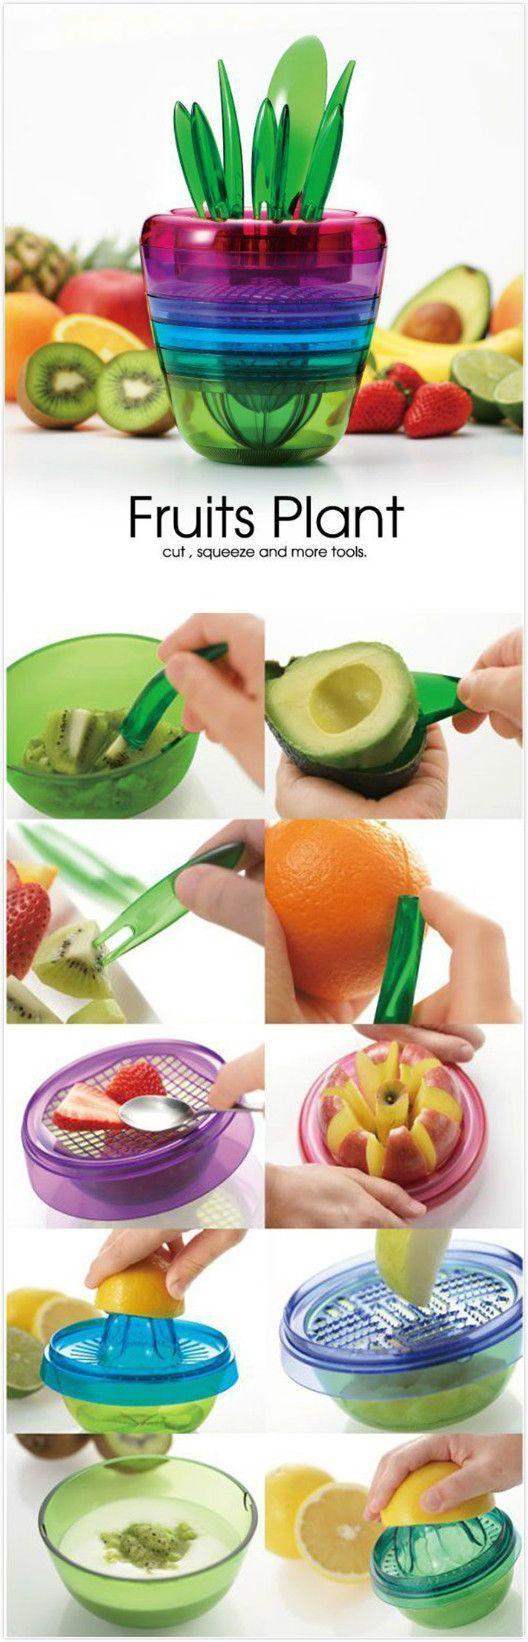 Fruit slicer,coupon code:Happyday07 ,10% off .#discount #gadgets #forthekitchen